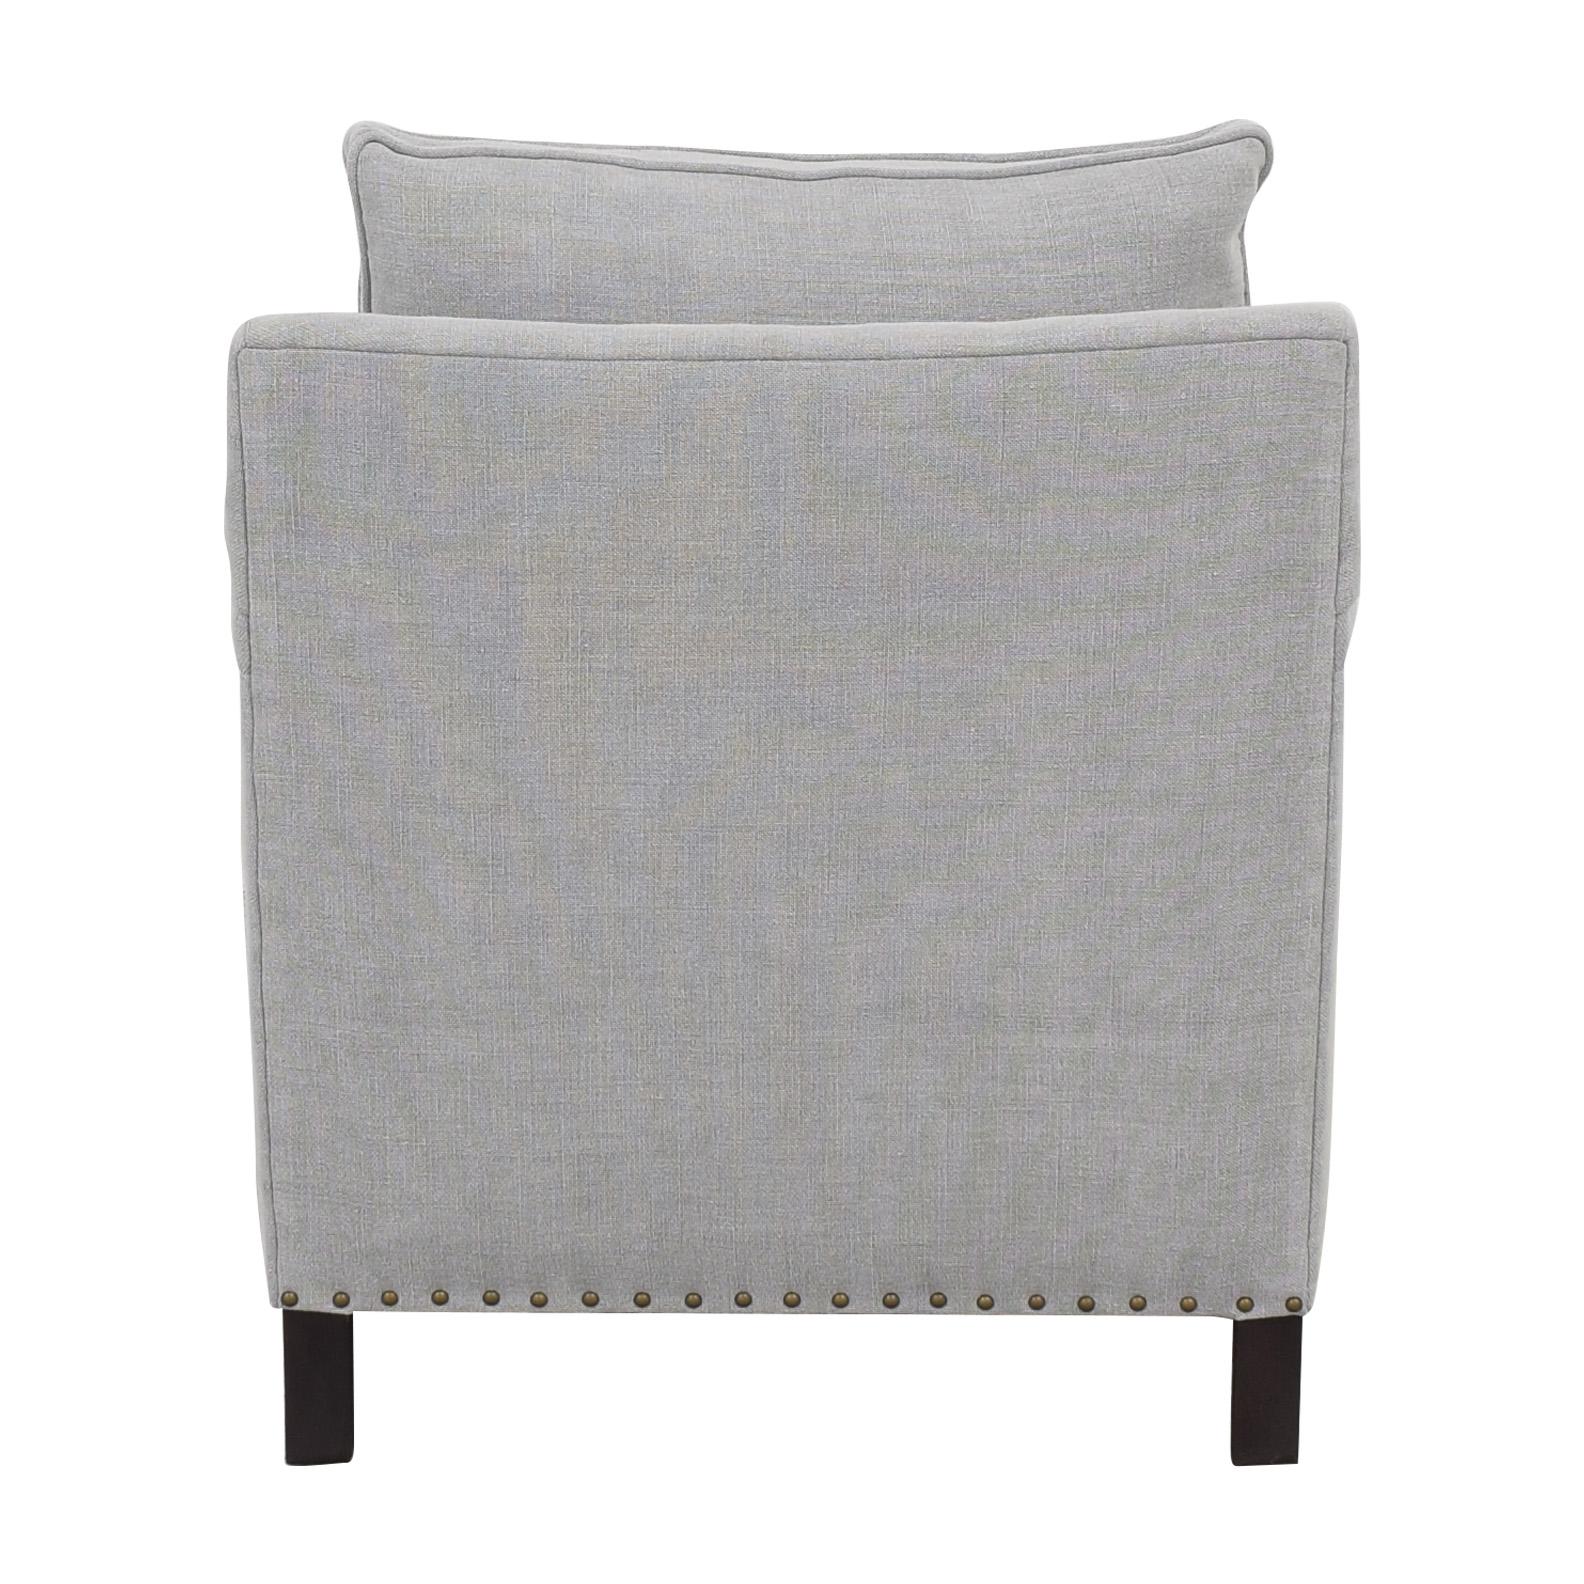 shop Williams Sonoma Williams Sonoma Addison Chair with Nailheads online